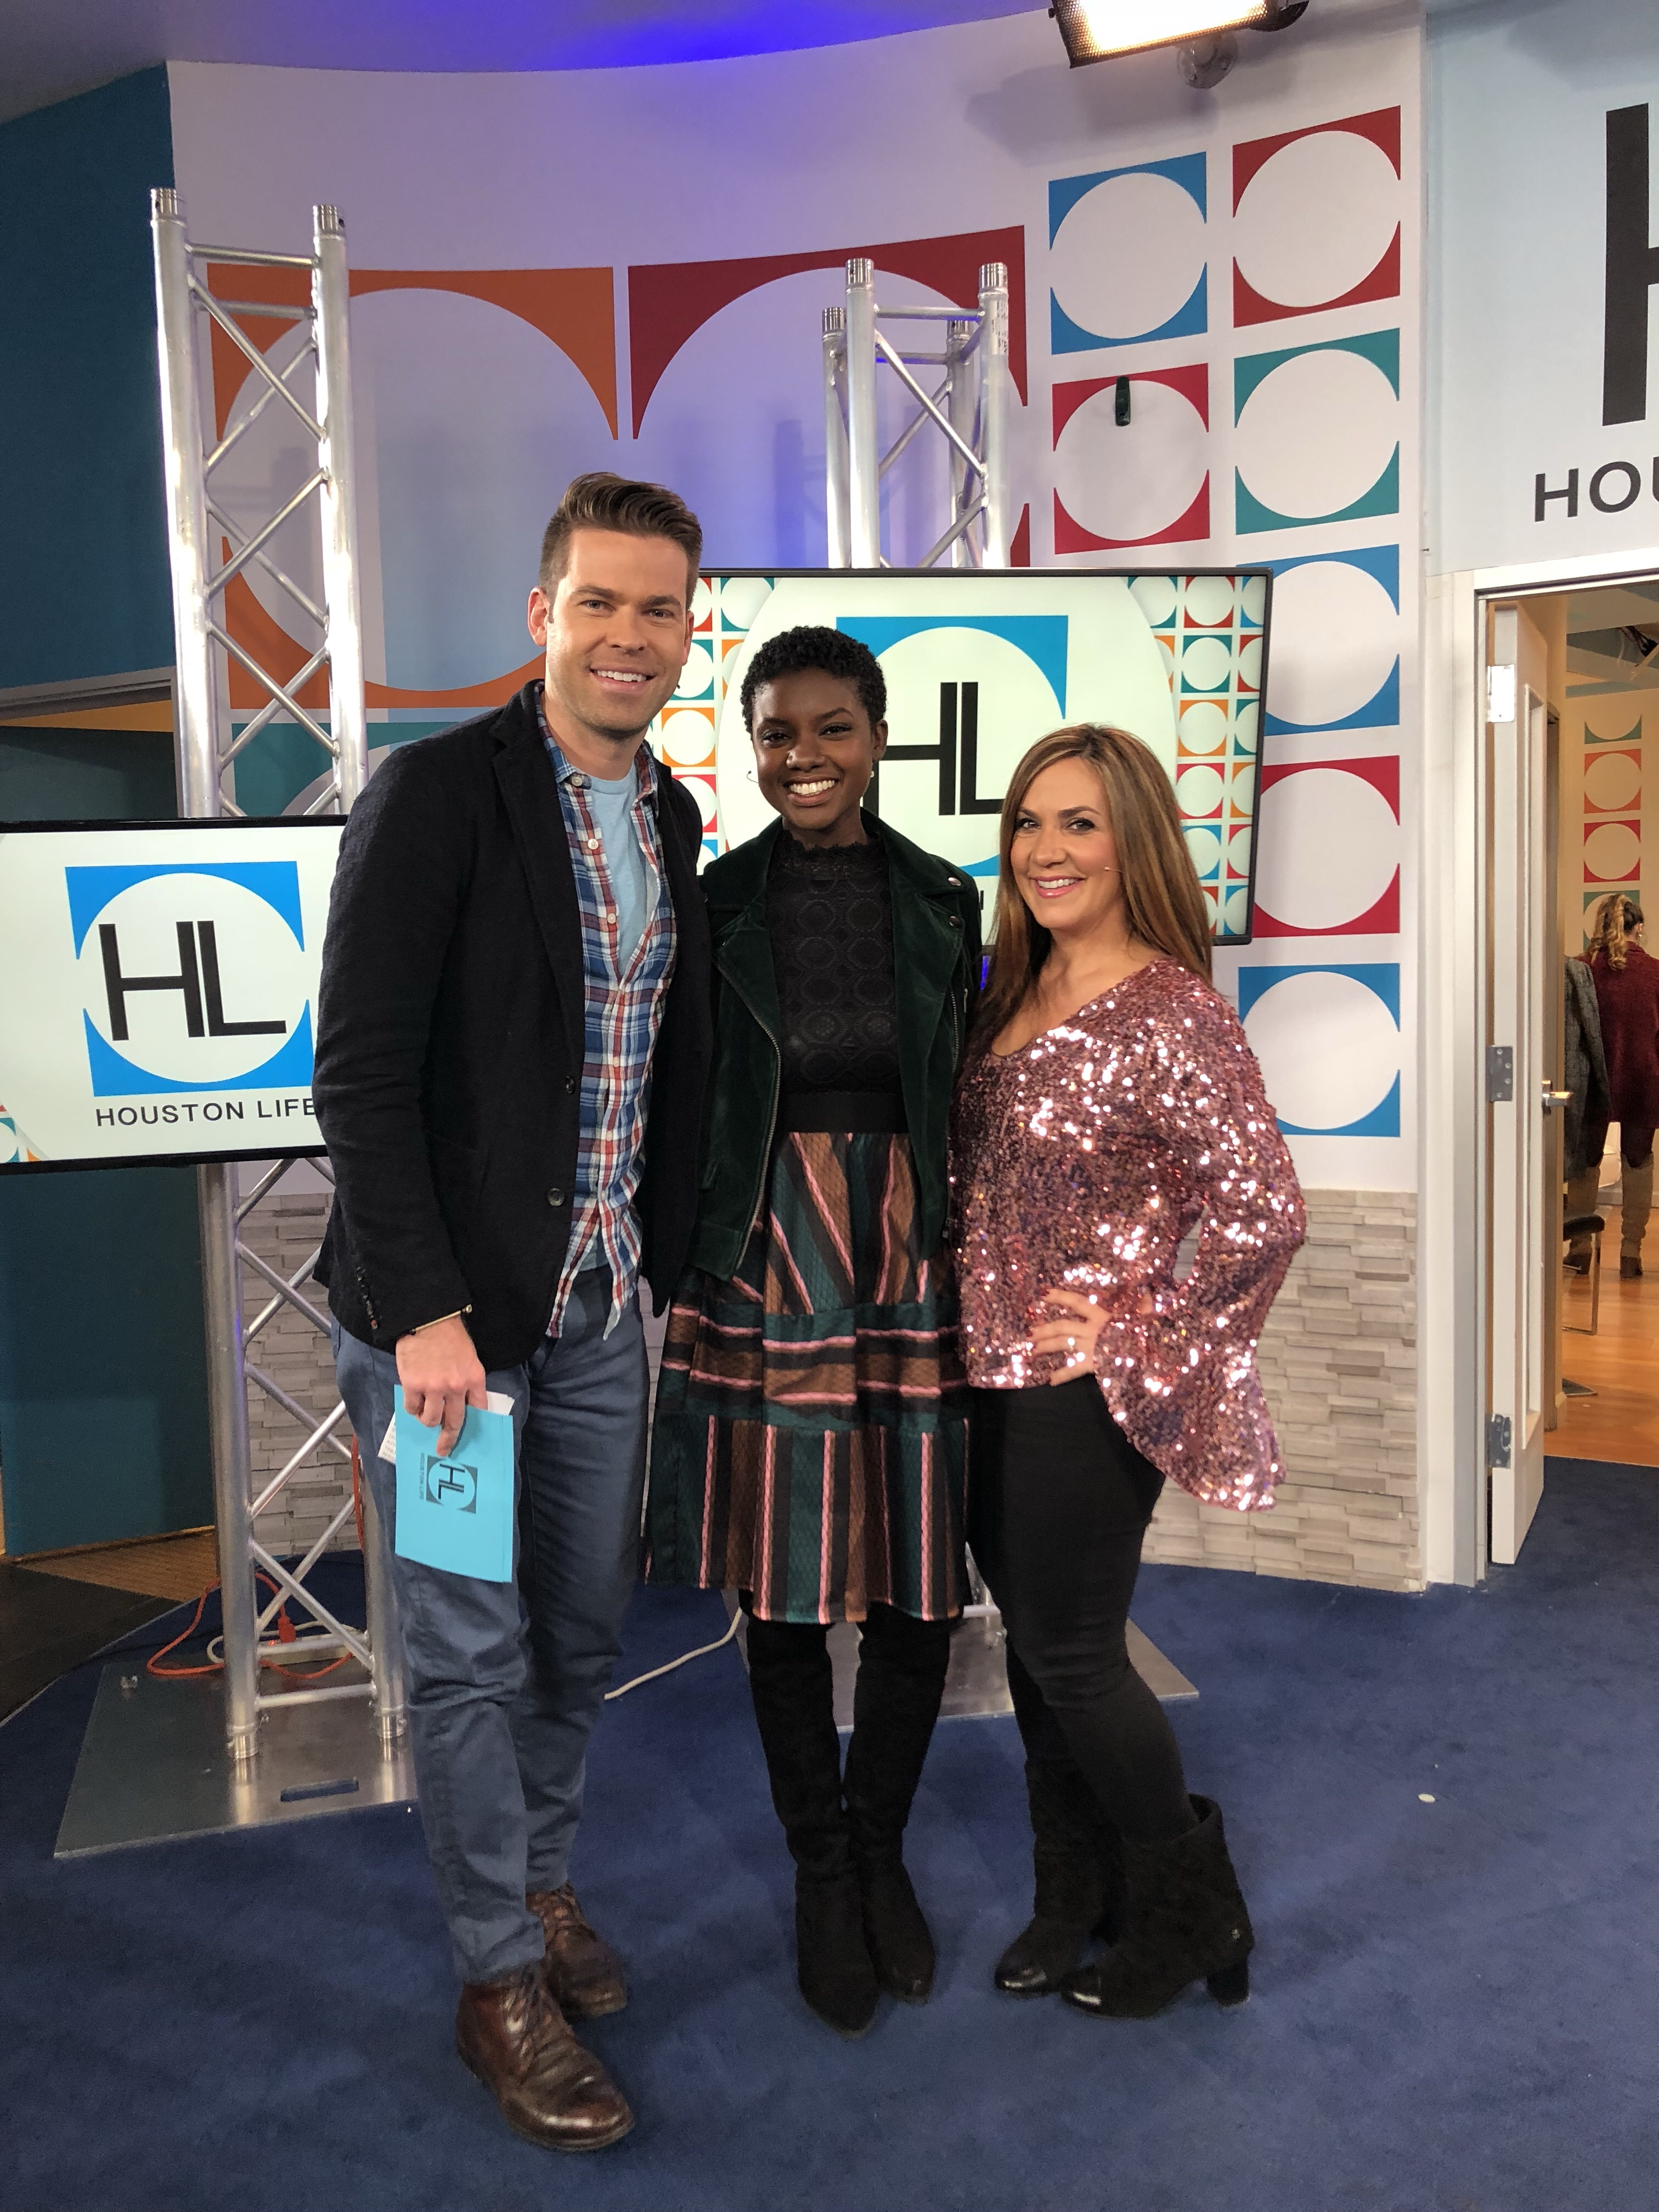 Houston Life TV, Channel 2, Courtney Zavala, Derrick Shore, Style expert, crossroads Houston